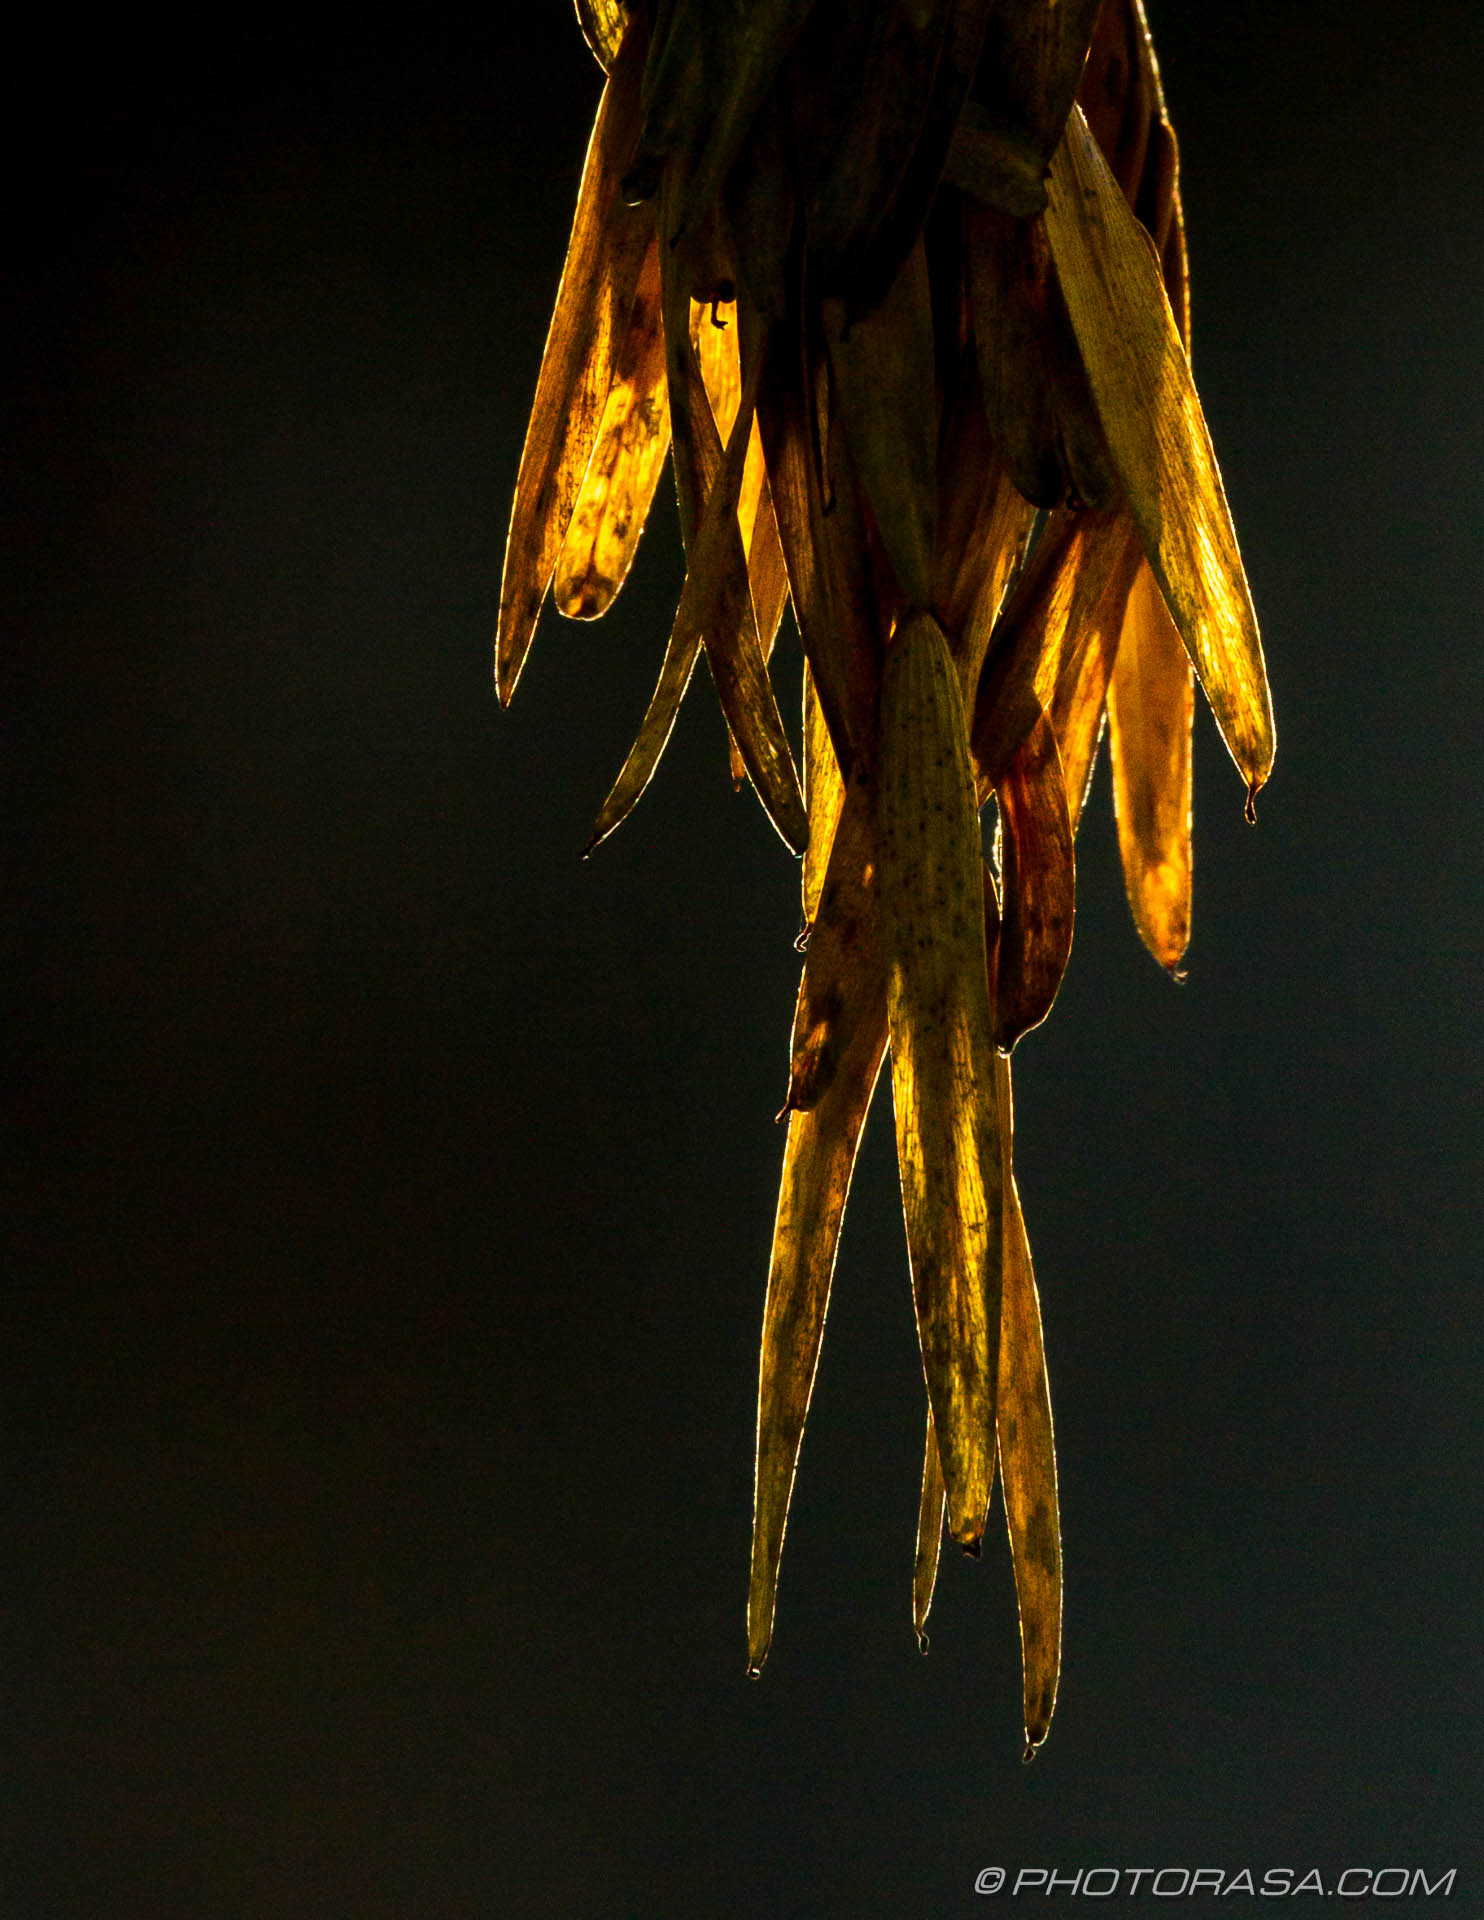 http://photorasa.com/autumn-leaves-sunlight/vegetation-hanging-from-tree-in-autumn/